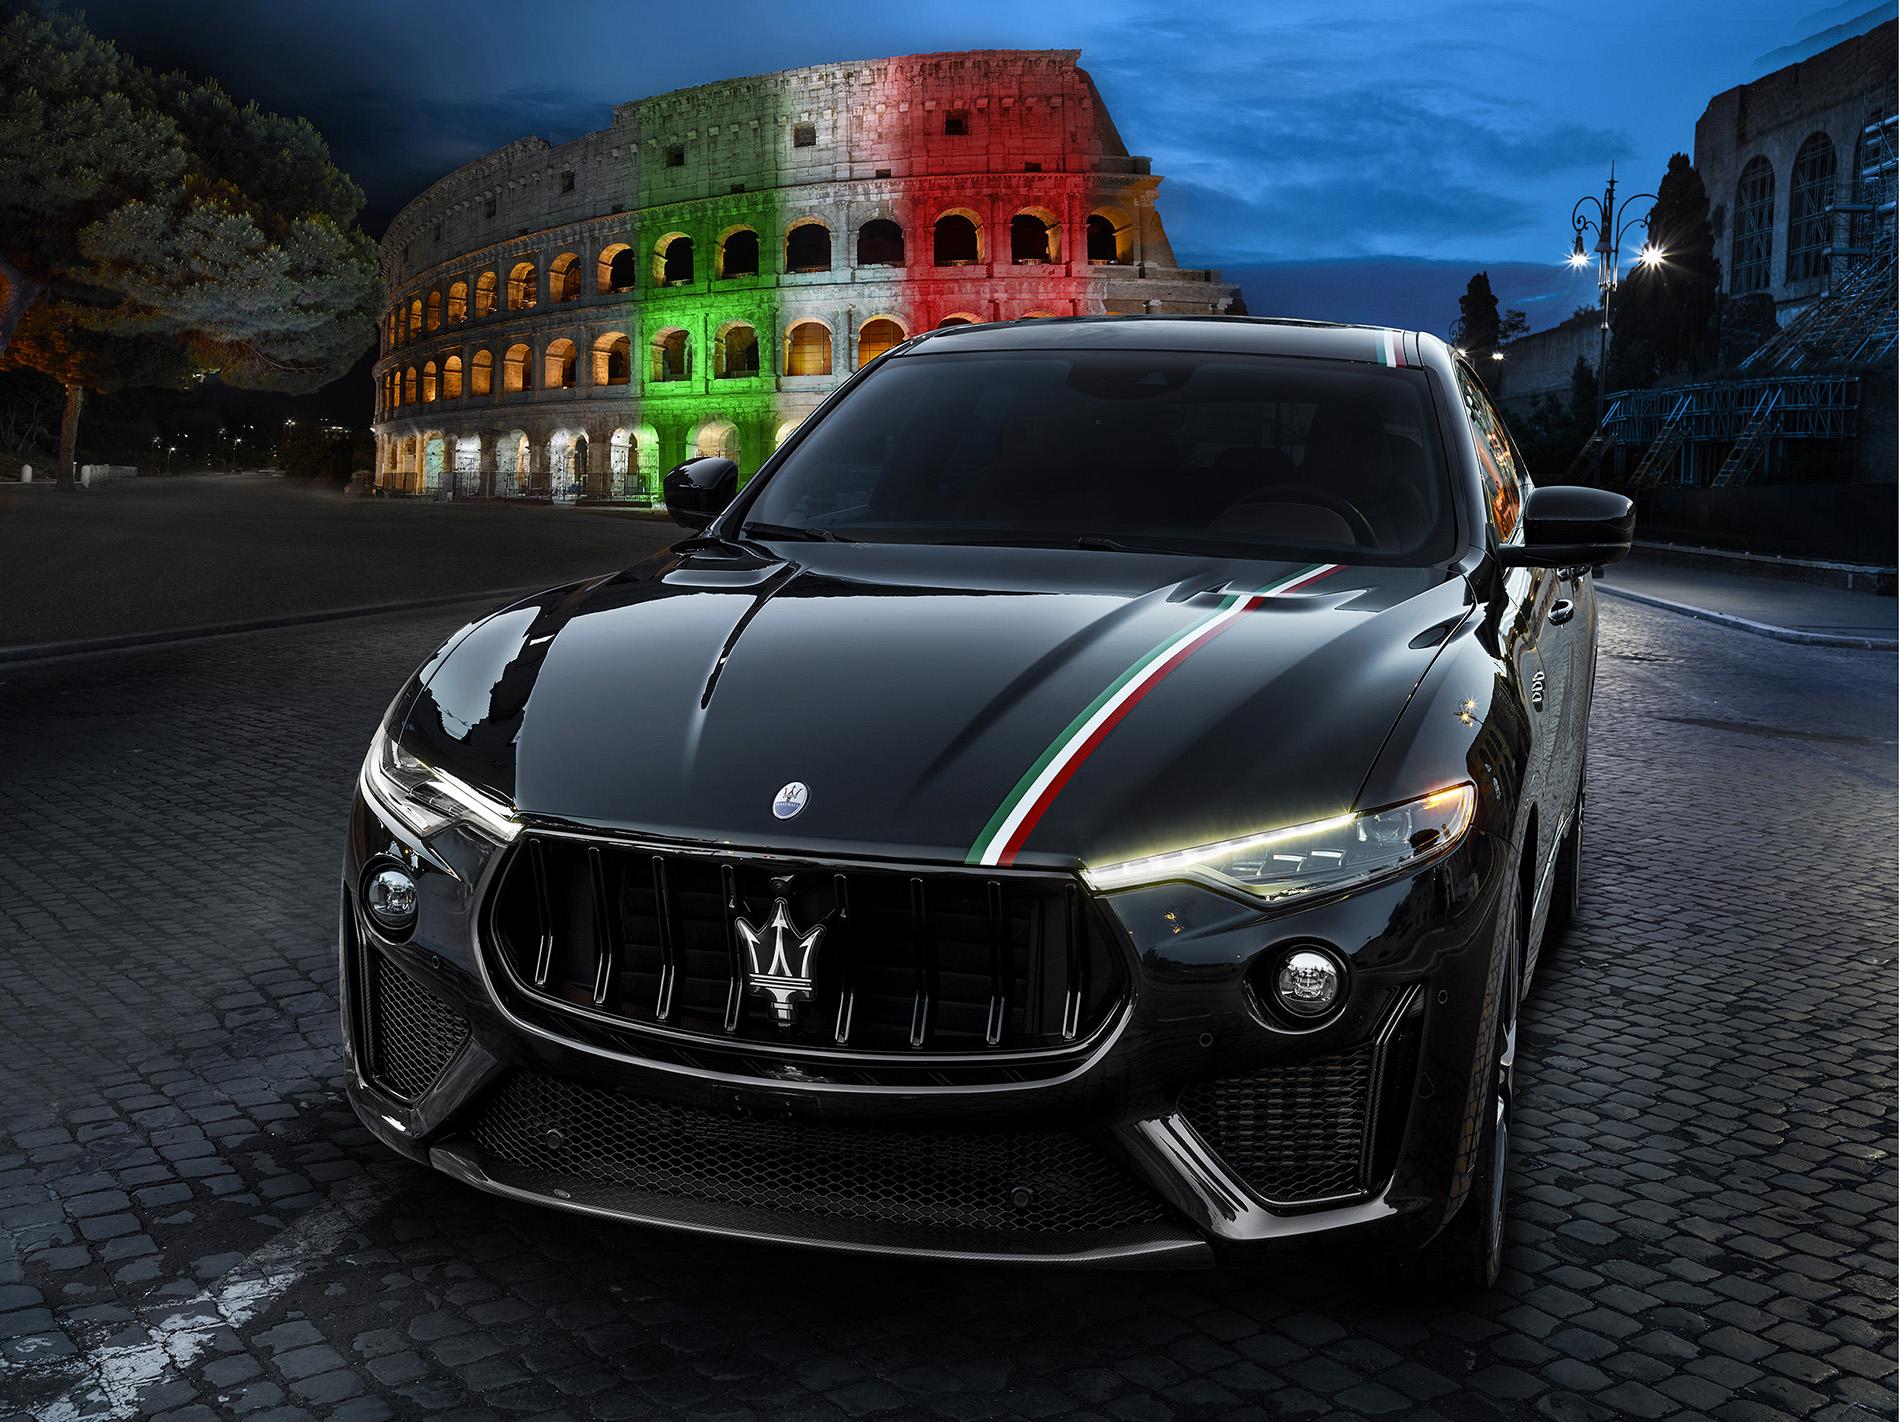 Maserati LevanteTrofeoLiveryItalyRome